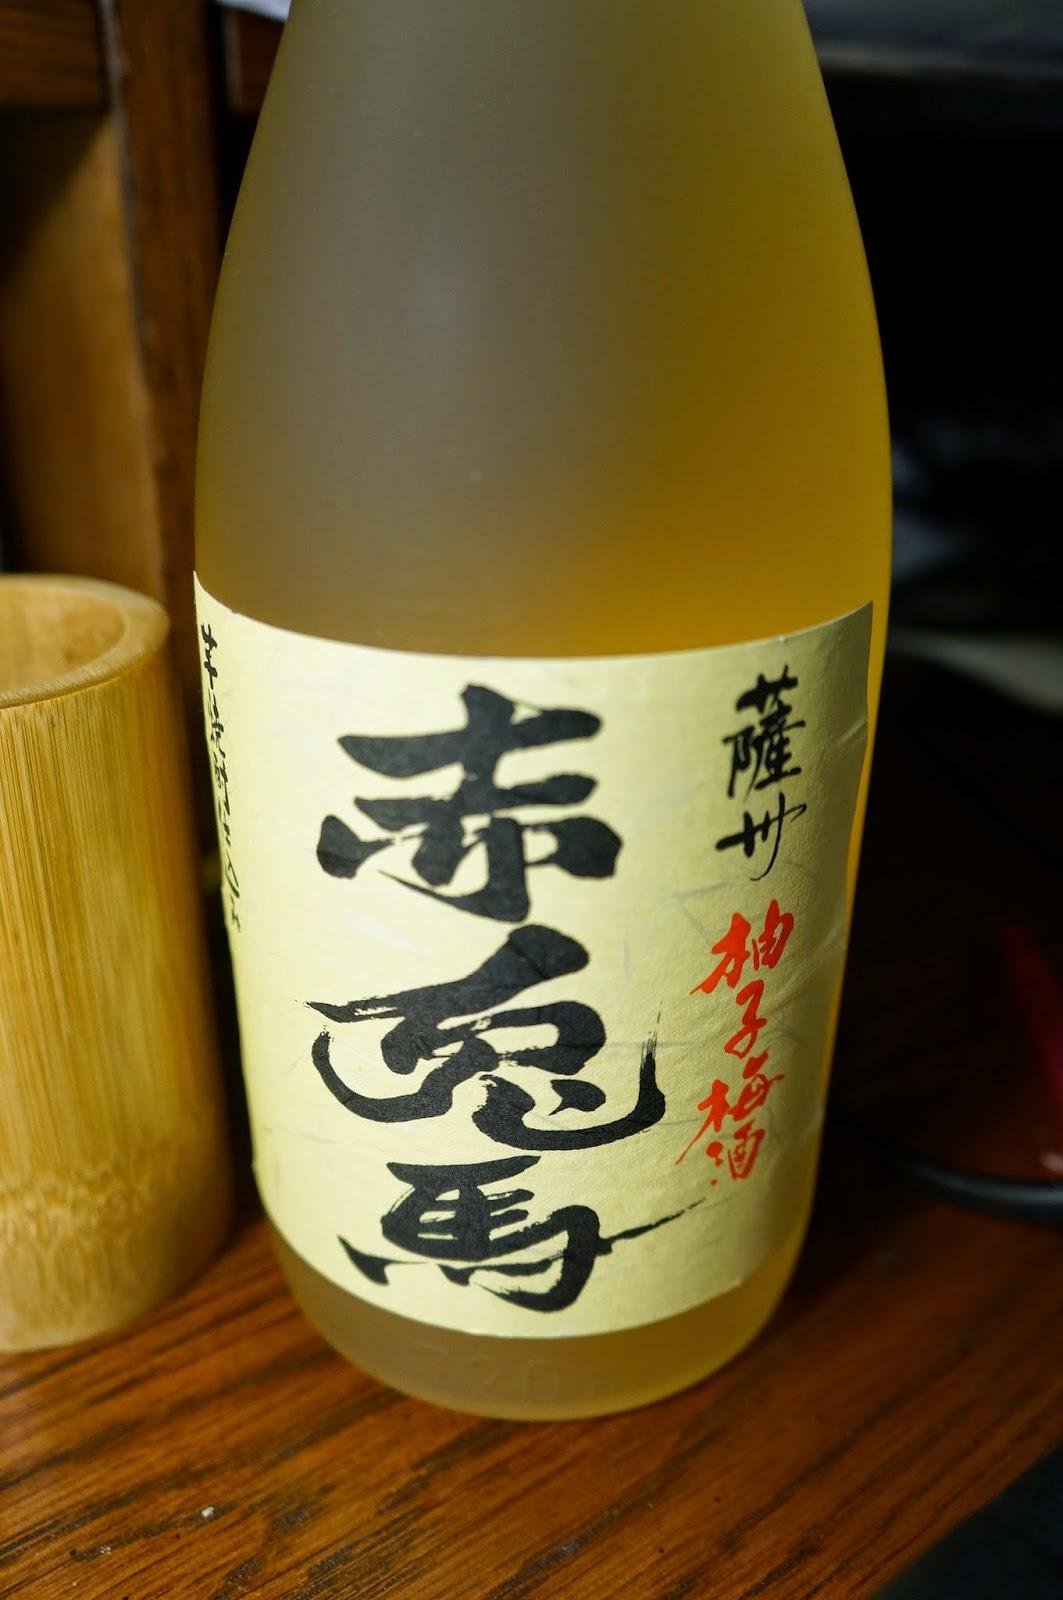 recipe umeshu plum wine jello dessert yokosuka food. Black Bedroom Furniture Sets. Home Design Ideas